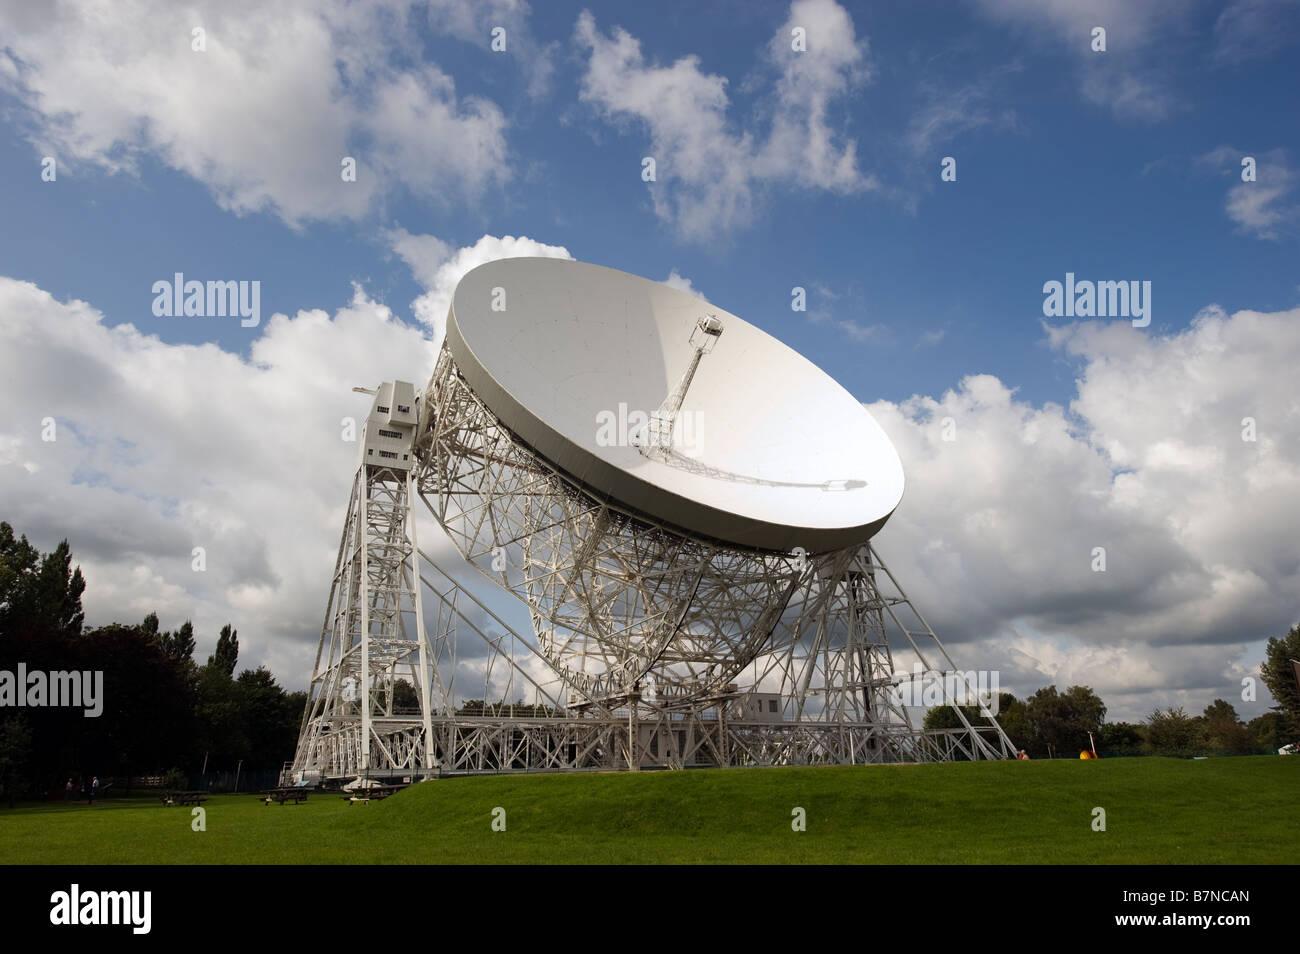 Lovell Telescope Jodrell Bank Cheshire - Stock Image